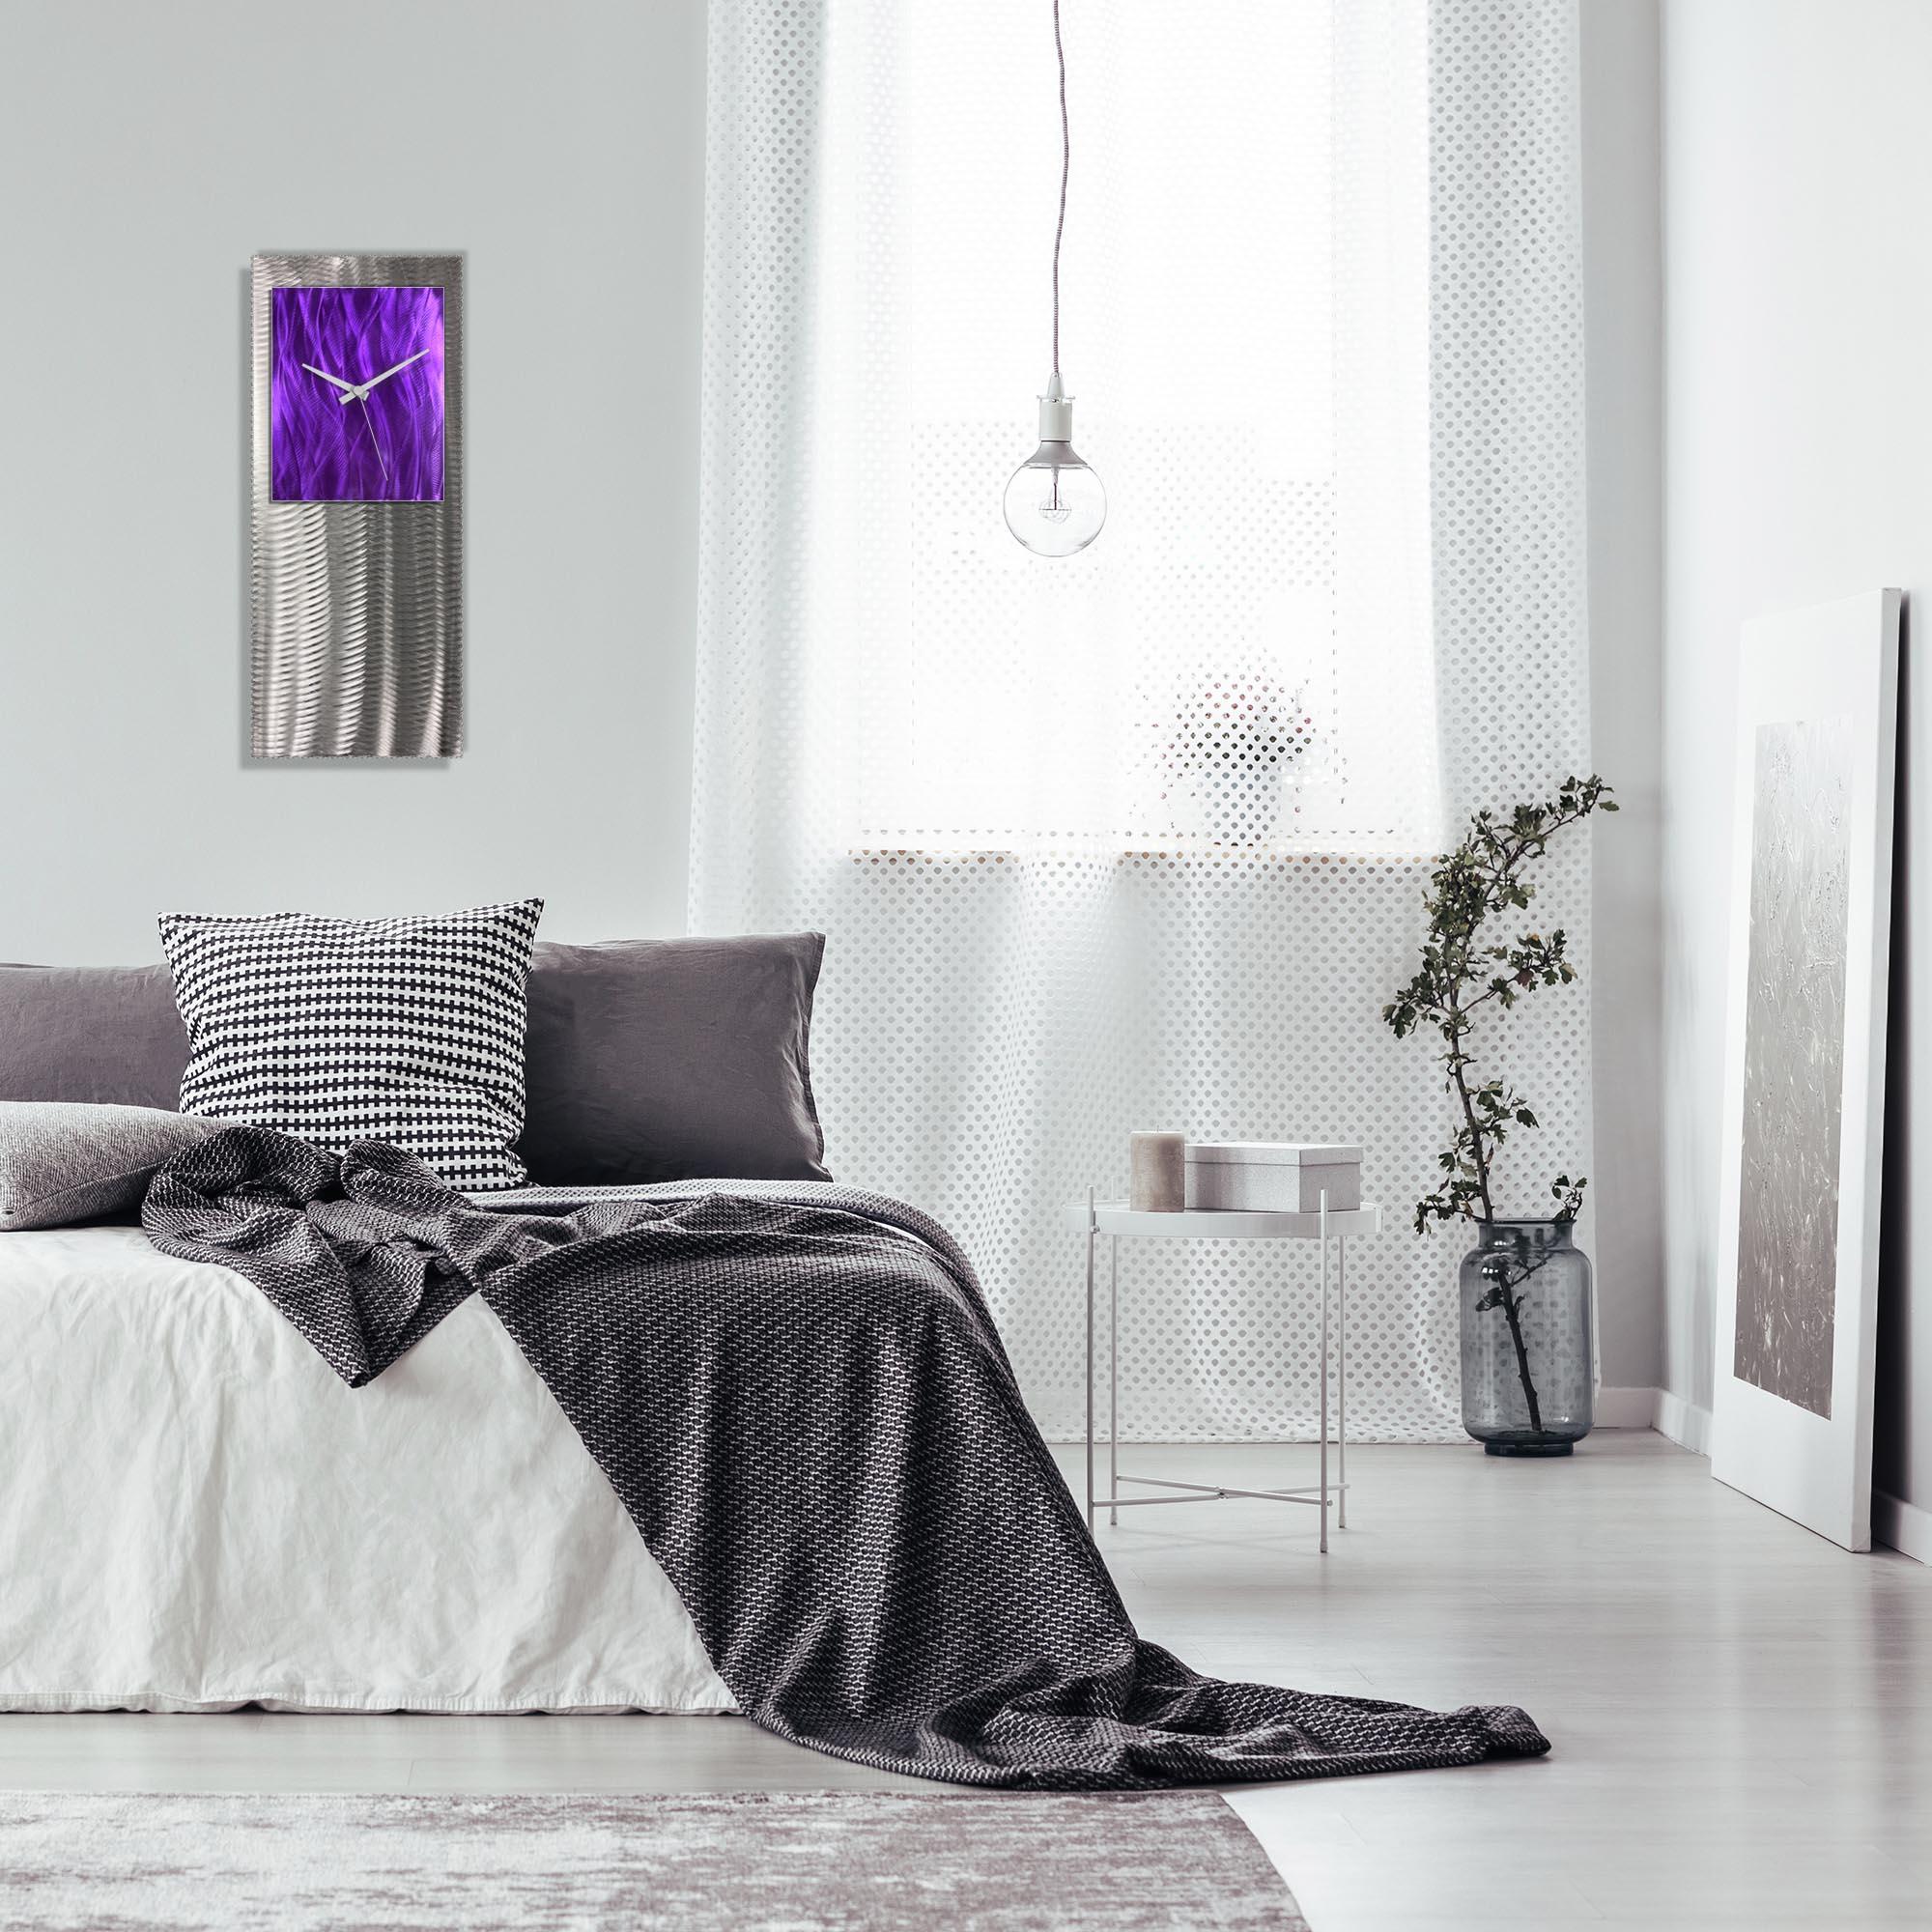 Metal Art Studio Abstract Decor Purple Studio Clock 10in x 24in - Lifestyle View